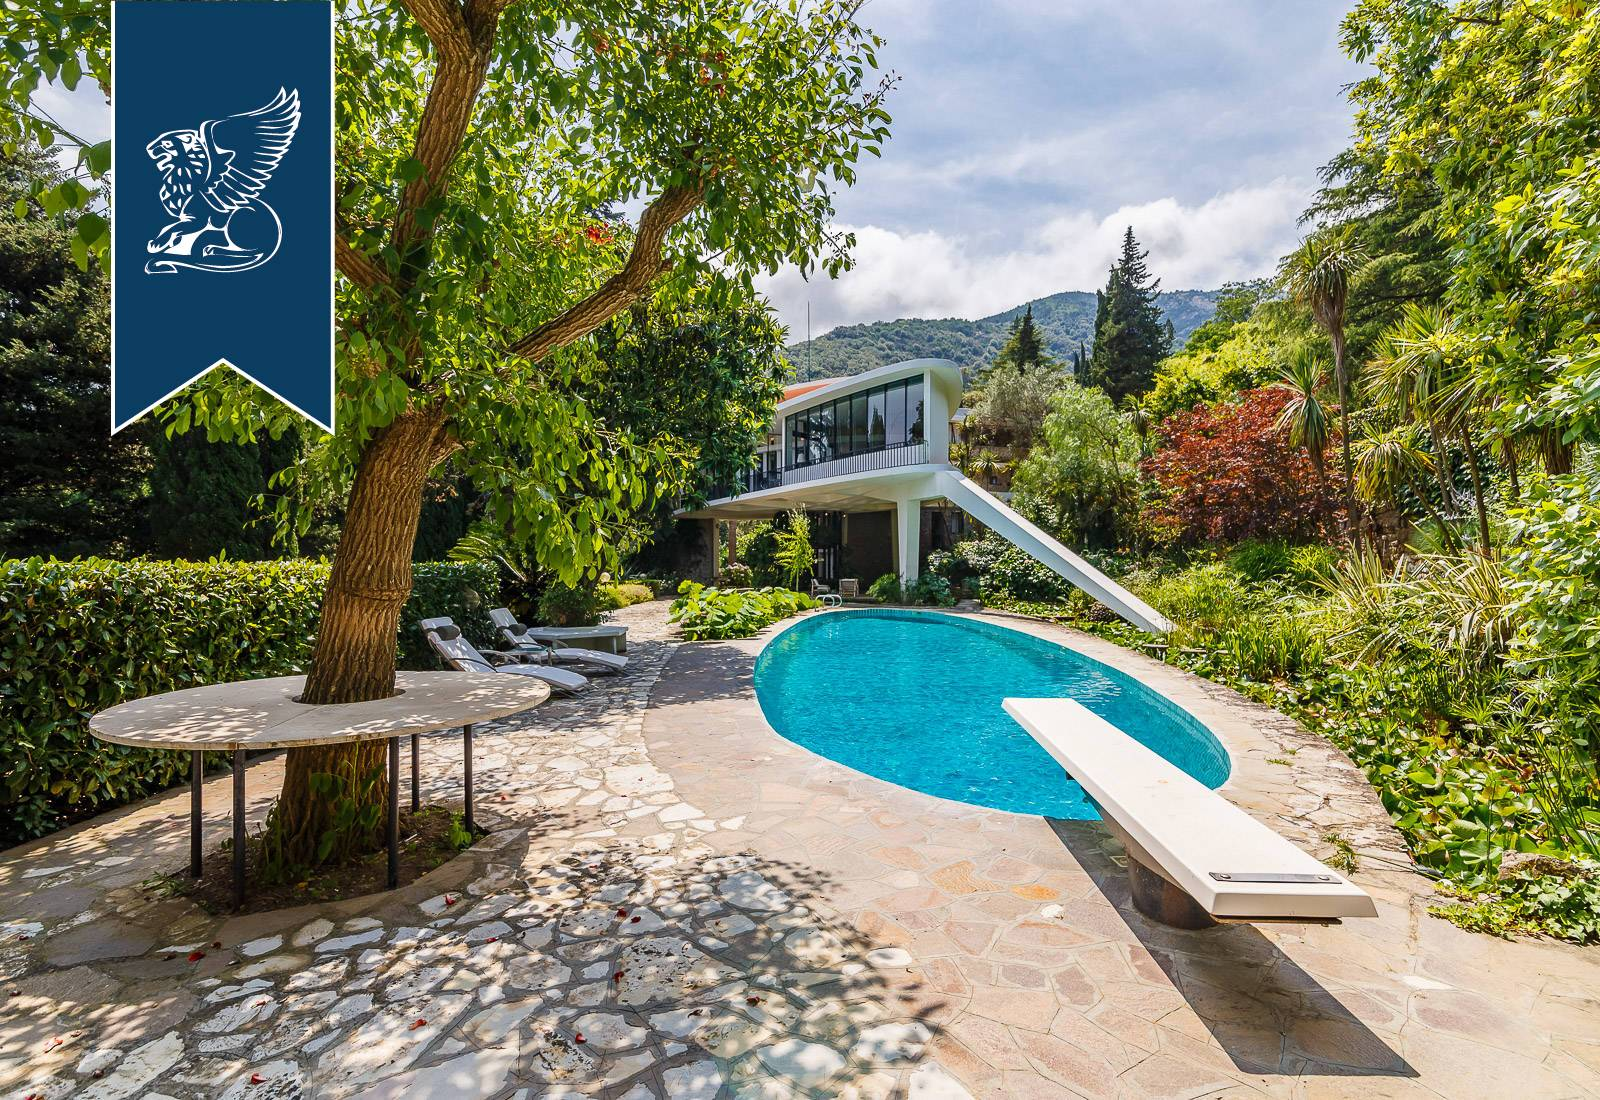 Villa in Vendita a Marciana Marina: 0 locali, 500 mq - Foto 3